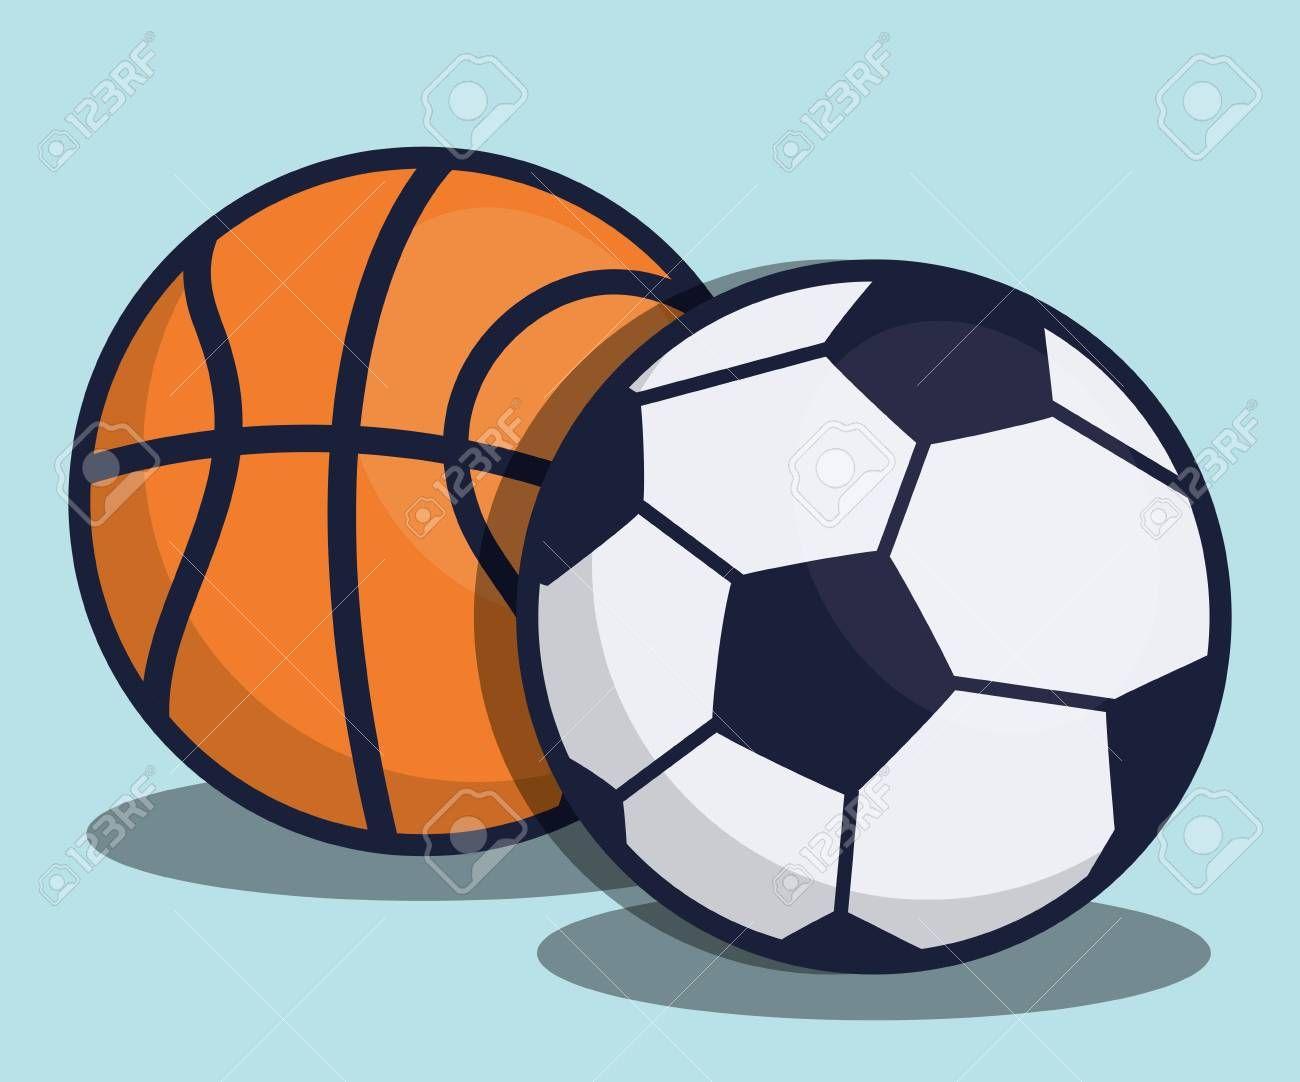 Soccer And Basketball Balls Icon Over Background Vector Illustration Aff Balls Basketball Soccer Icon Illustration